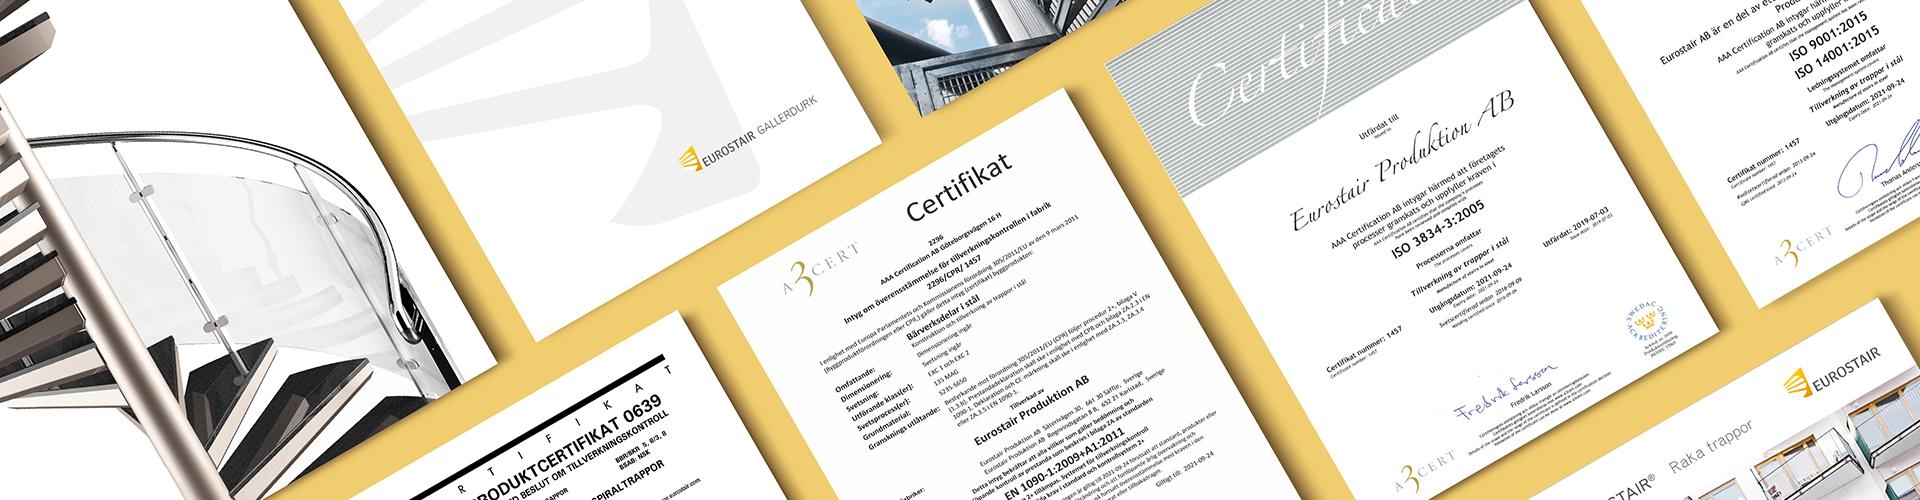 broschyrer certifikat dokument